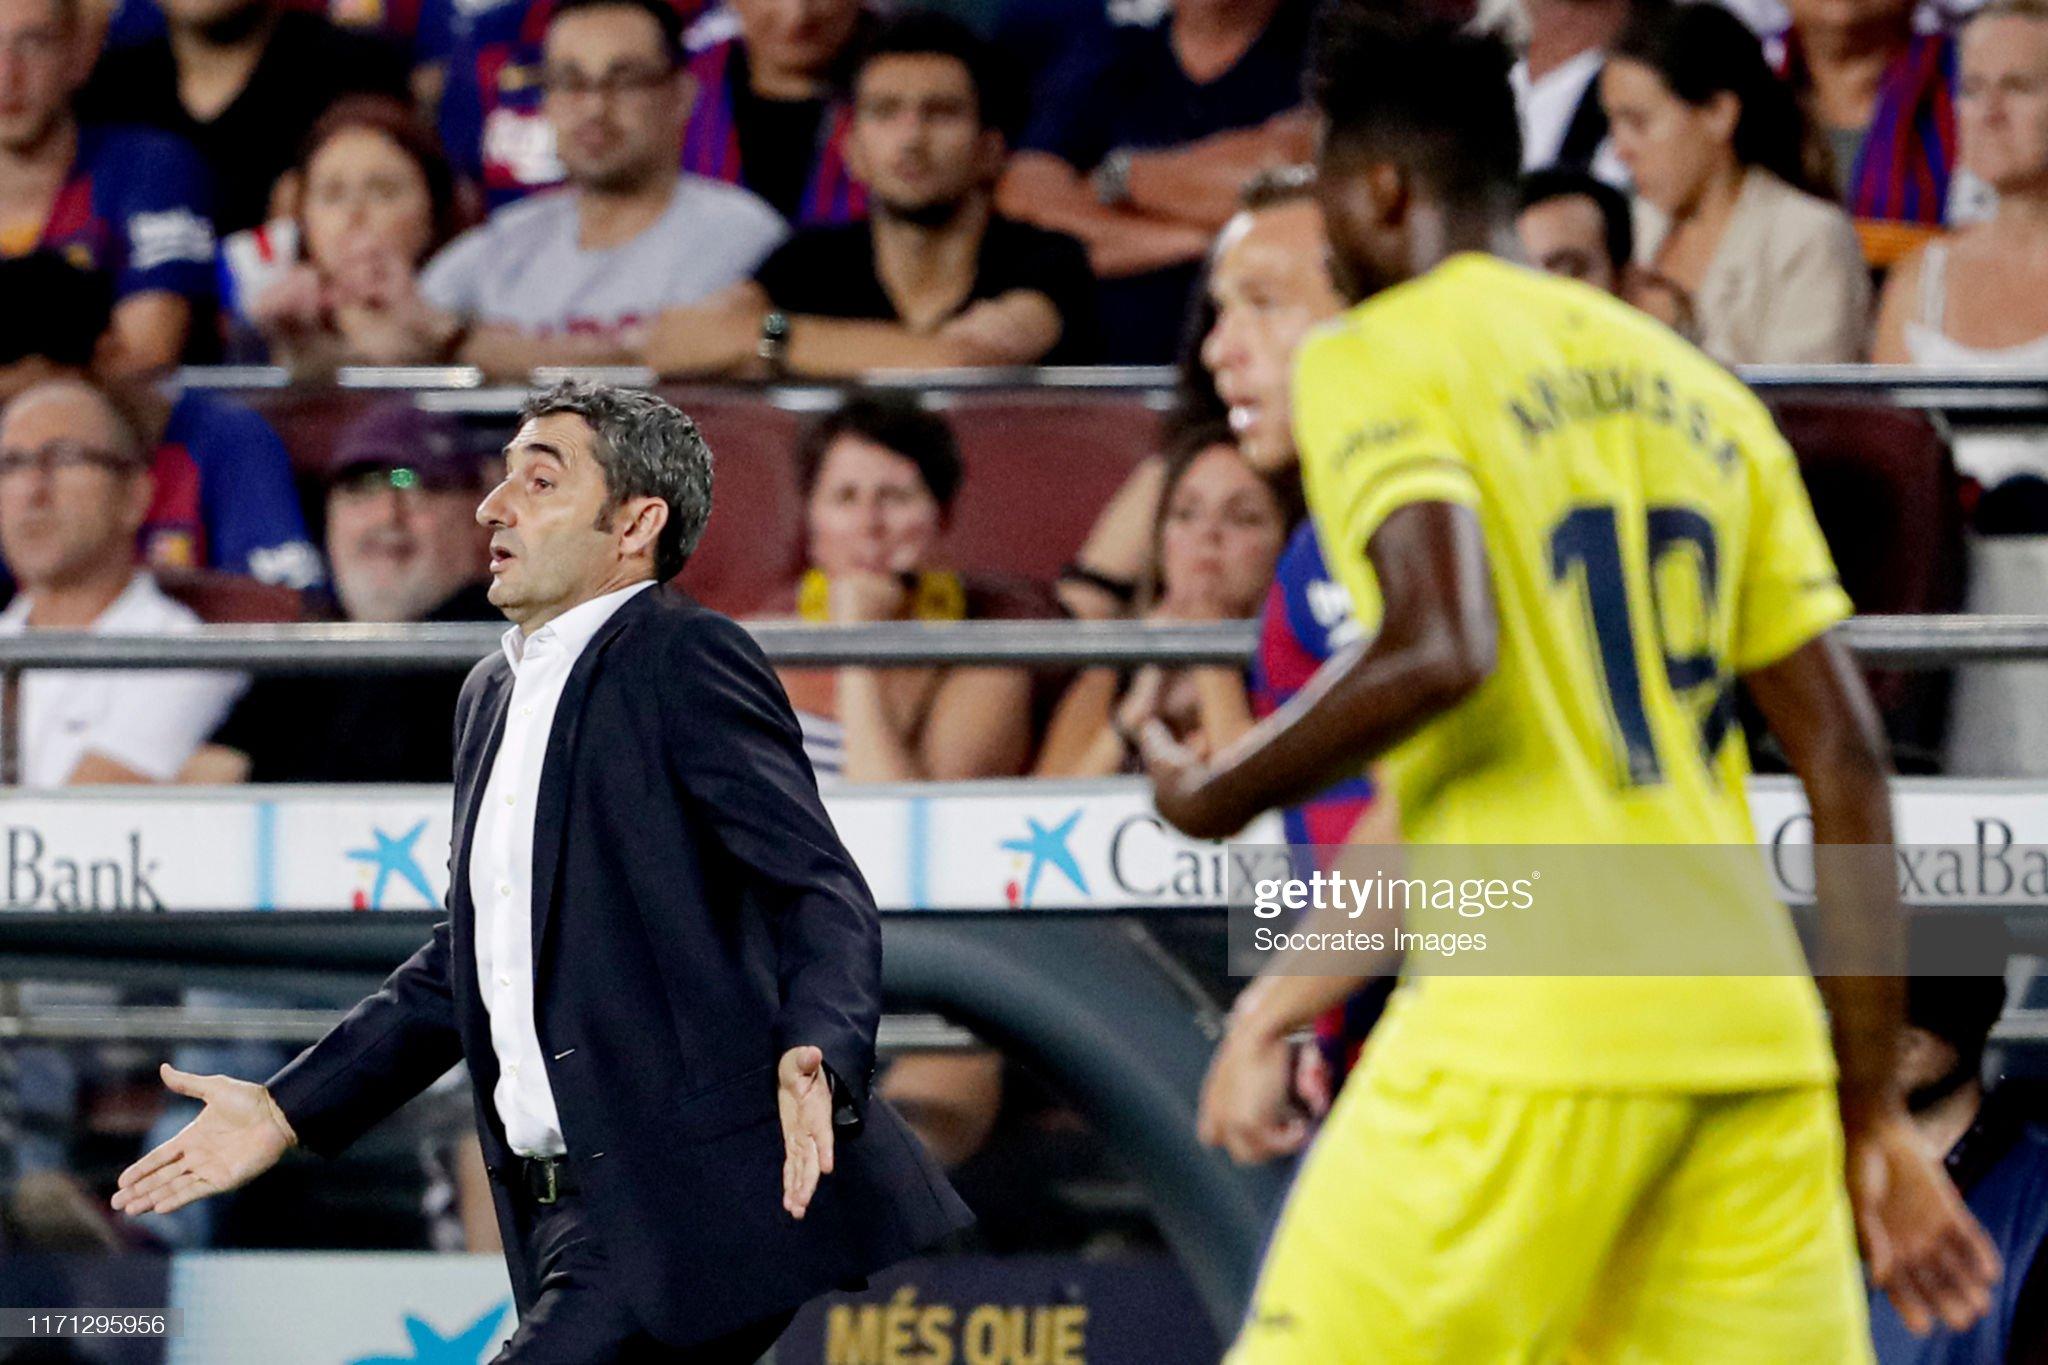 صور مباراة : برشلونة - فياريال 2-1 ( 24-09-2019 )  Coach-ernesto-valverde-of-fc-barcelona-during-the-la-liga-santander-picture-id1171295956?s=2048x2048